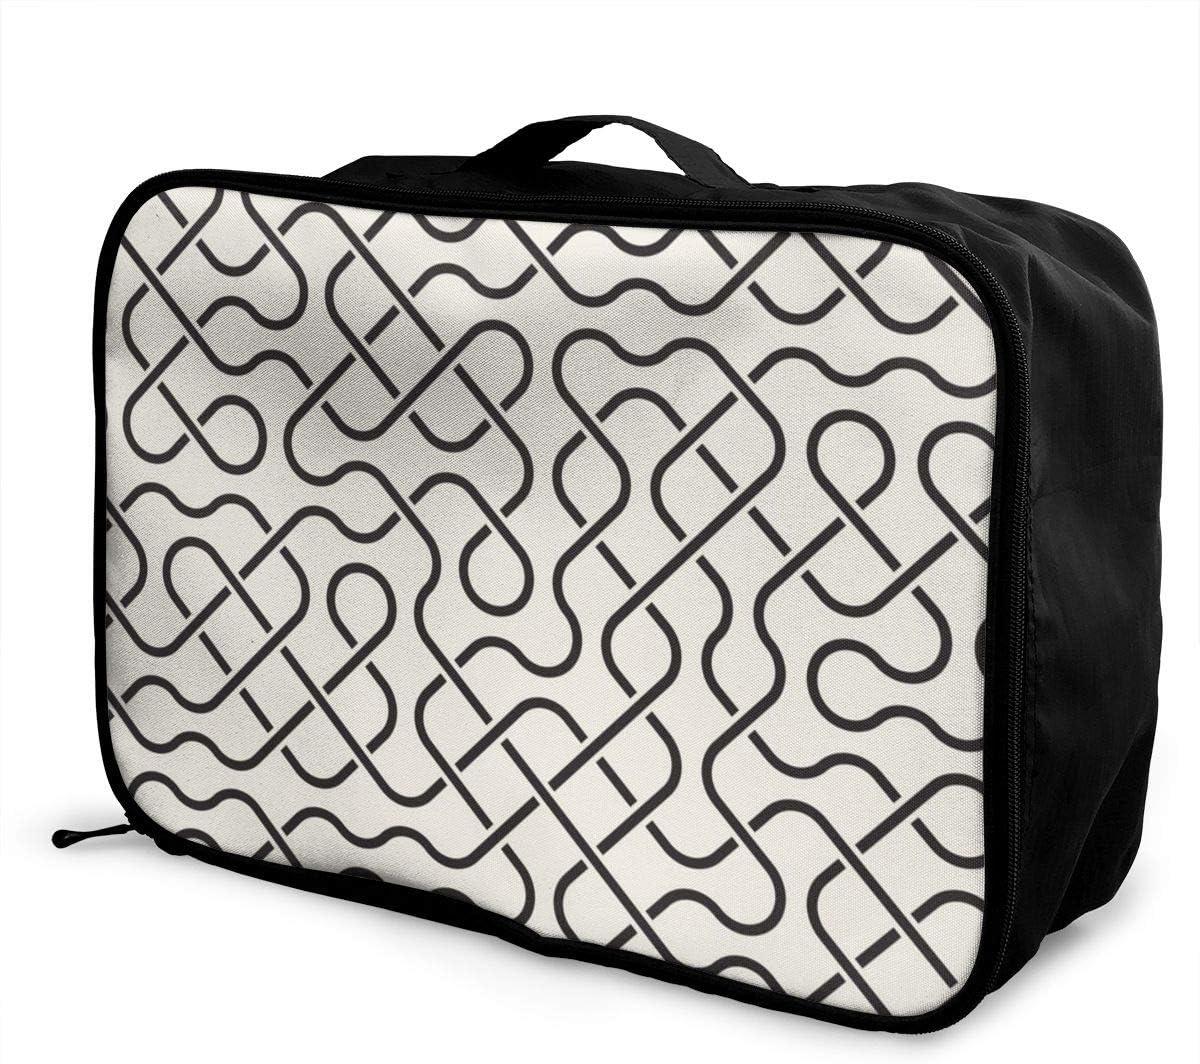 Yunshm Line Mesh Geometric Patterns Customized Trolley Handbag Waterproof Unisex Large Capacity For Business Travel Storage